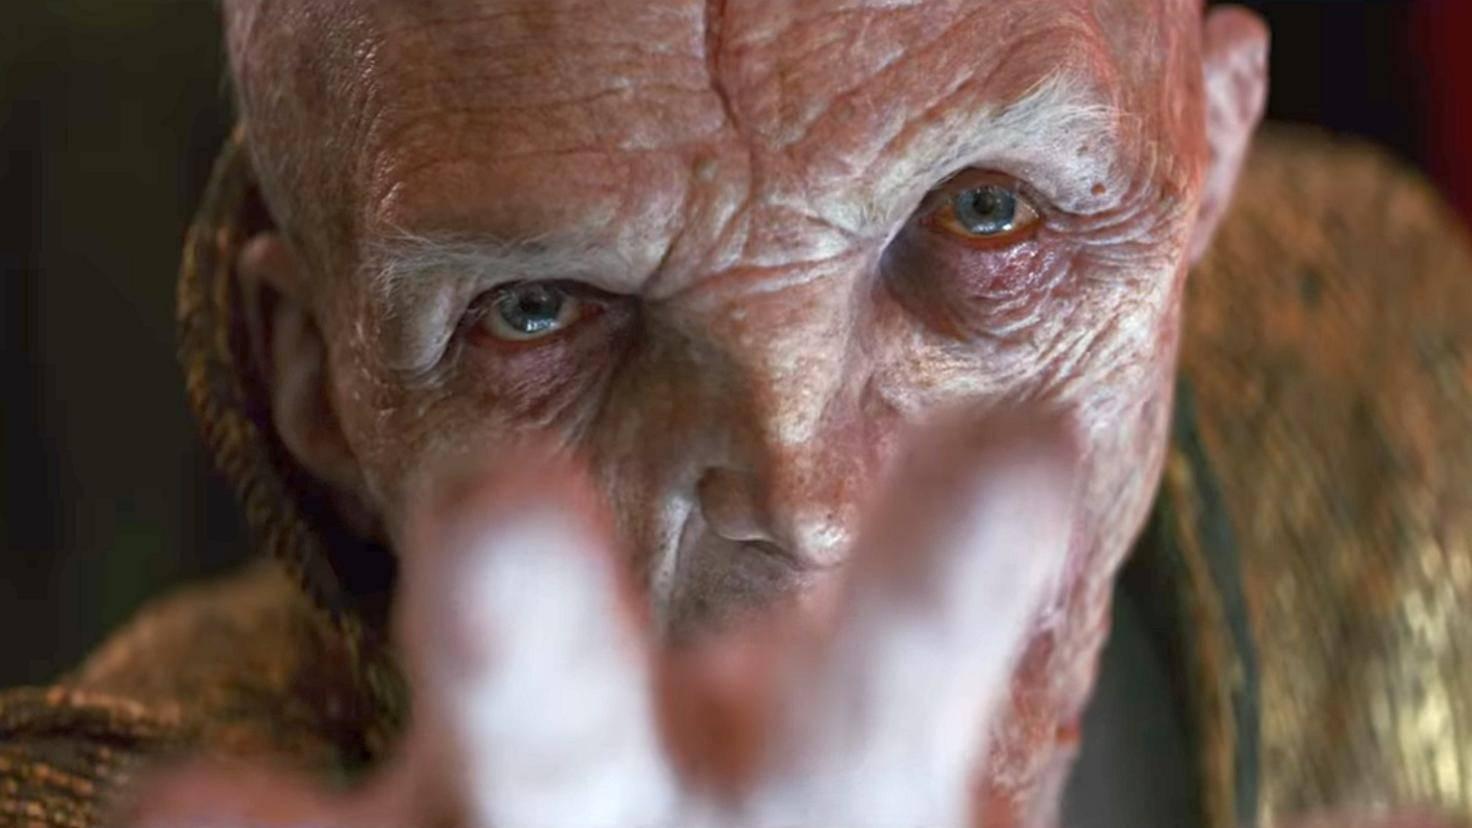 star-wars-die-letzten-jedi-trailer-snoke-youtube